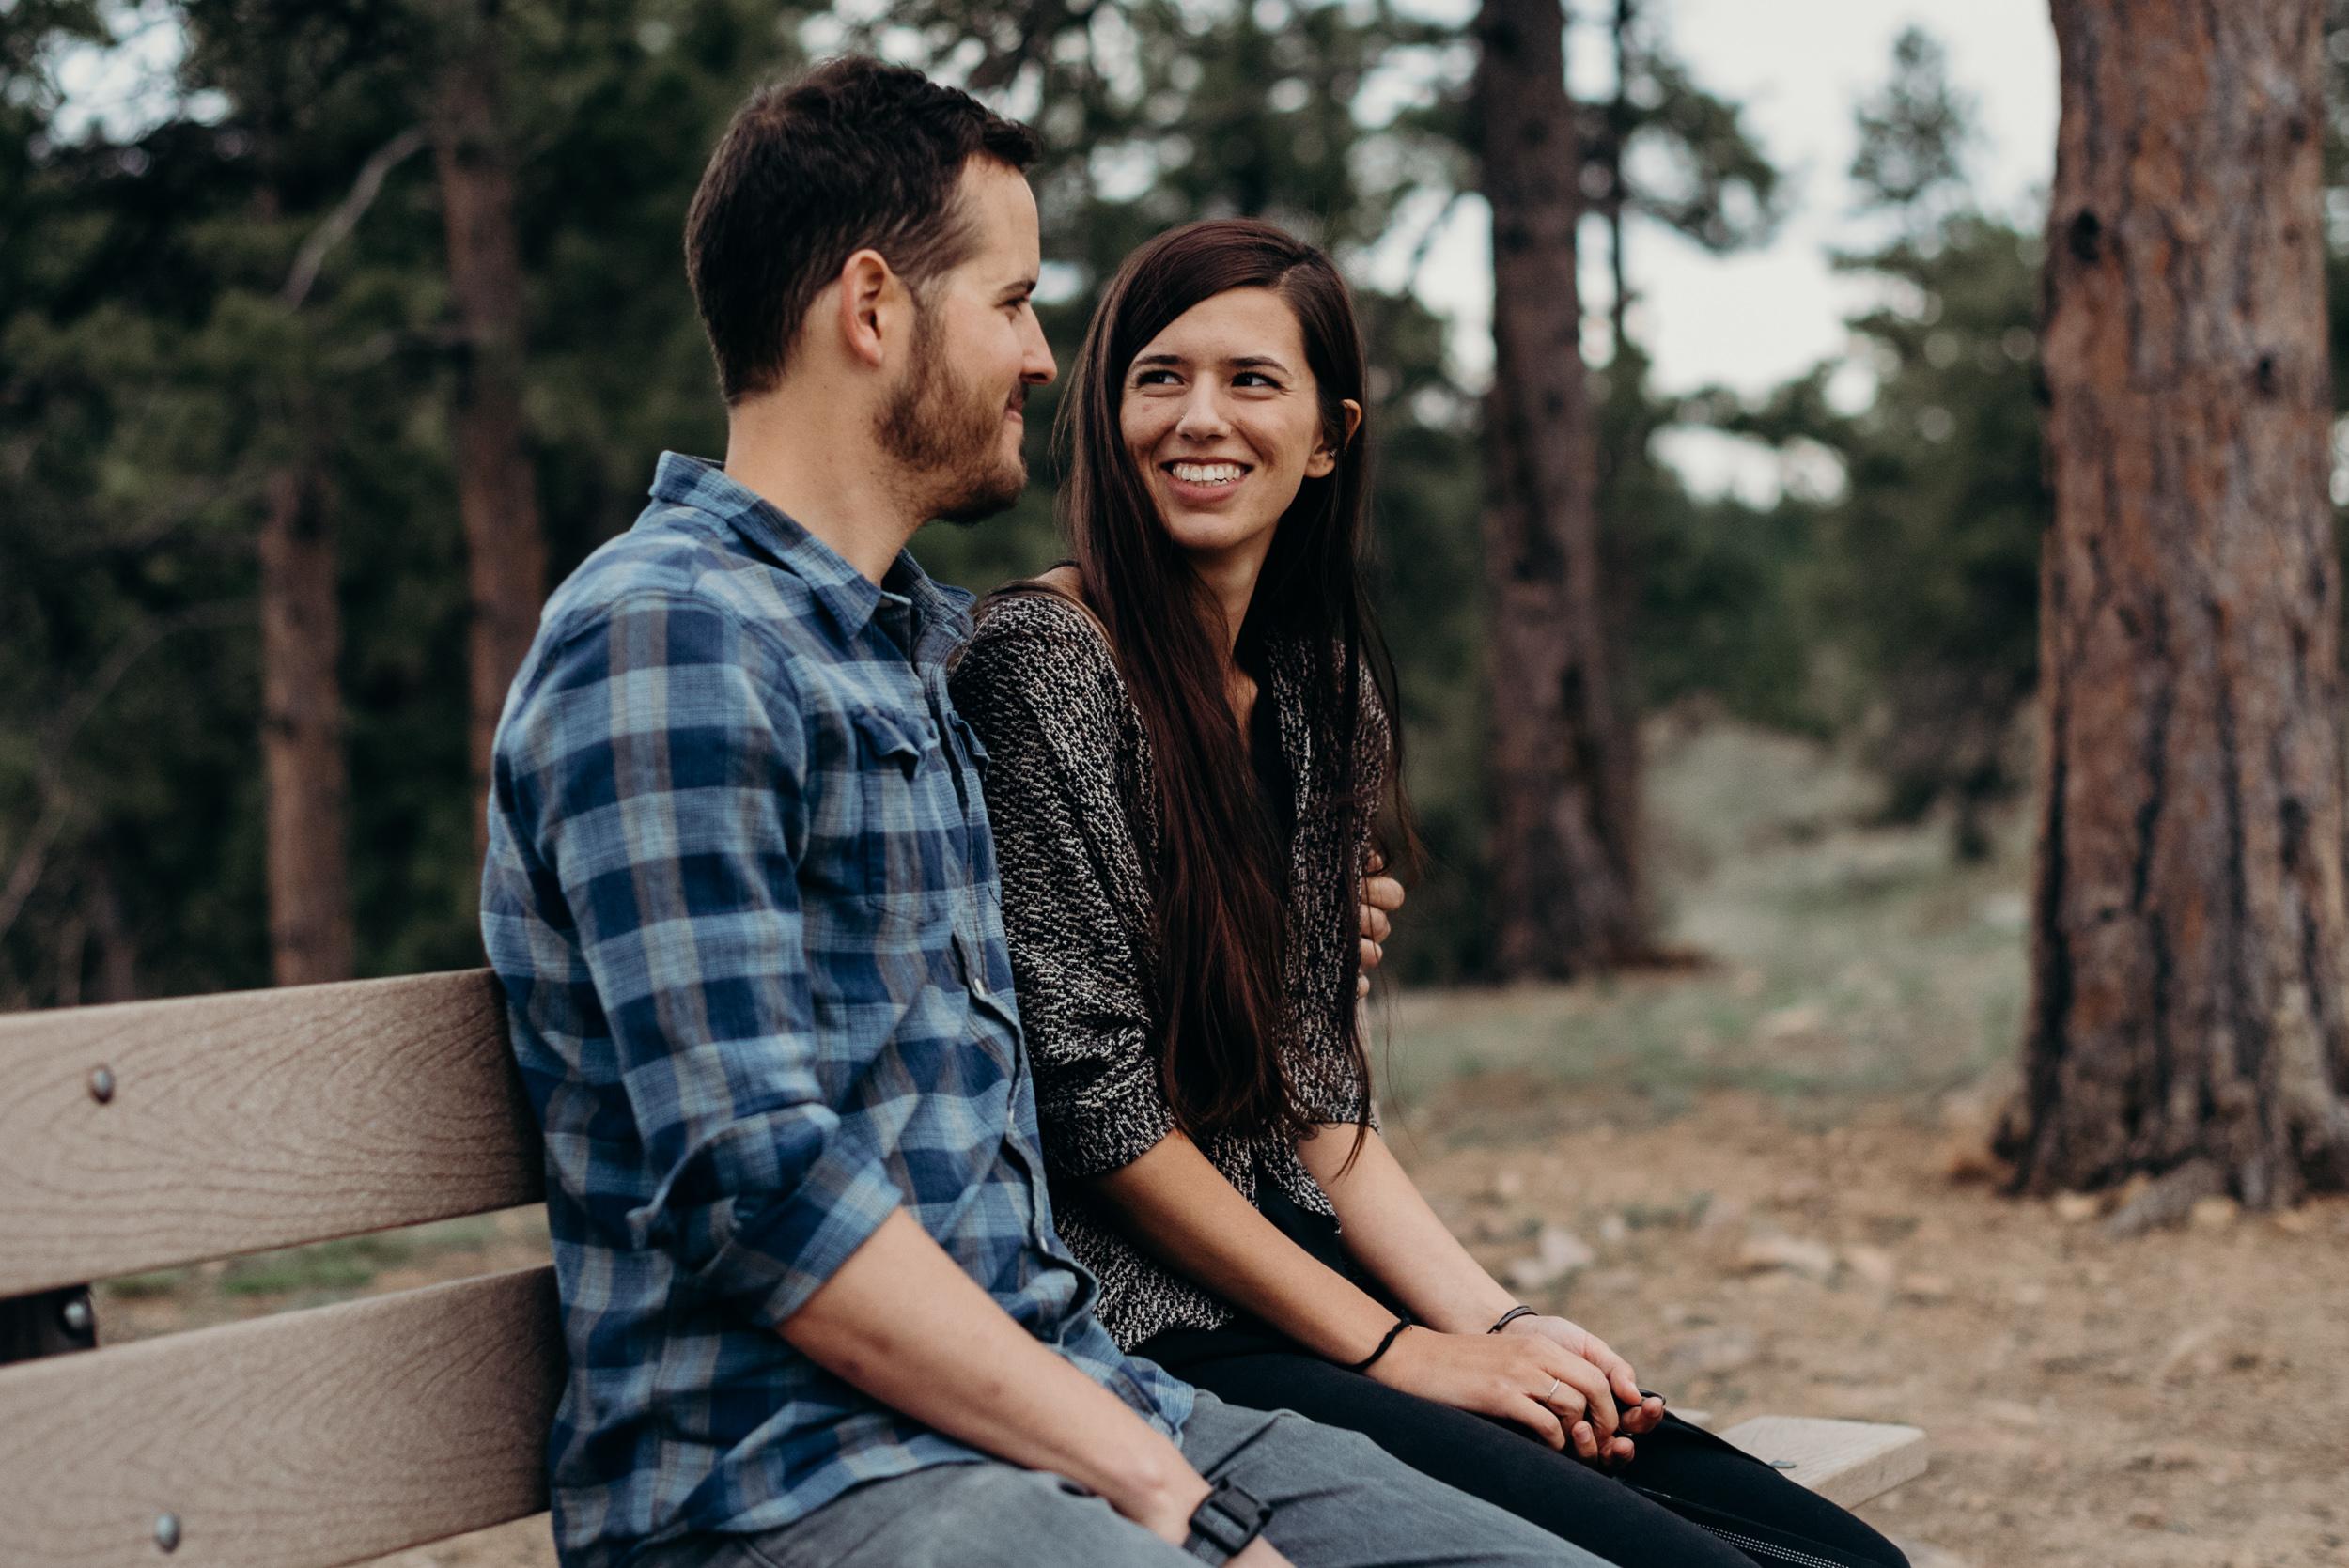 Denver-Colorado-Mt-Falcon-Engagement-Megan-Graham-Photography-7230.jpg